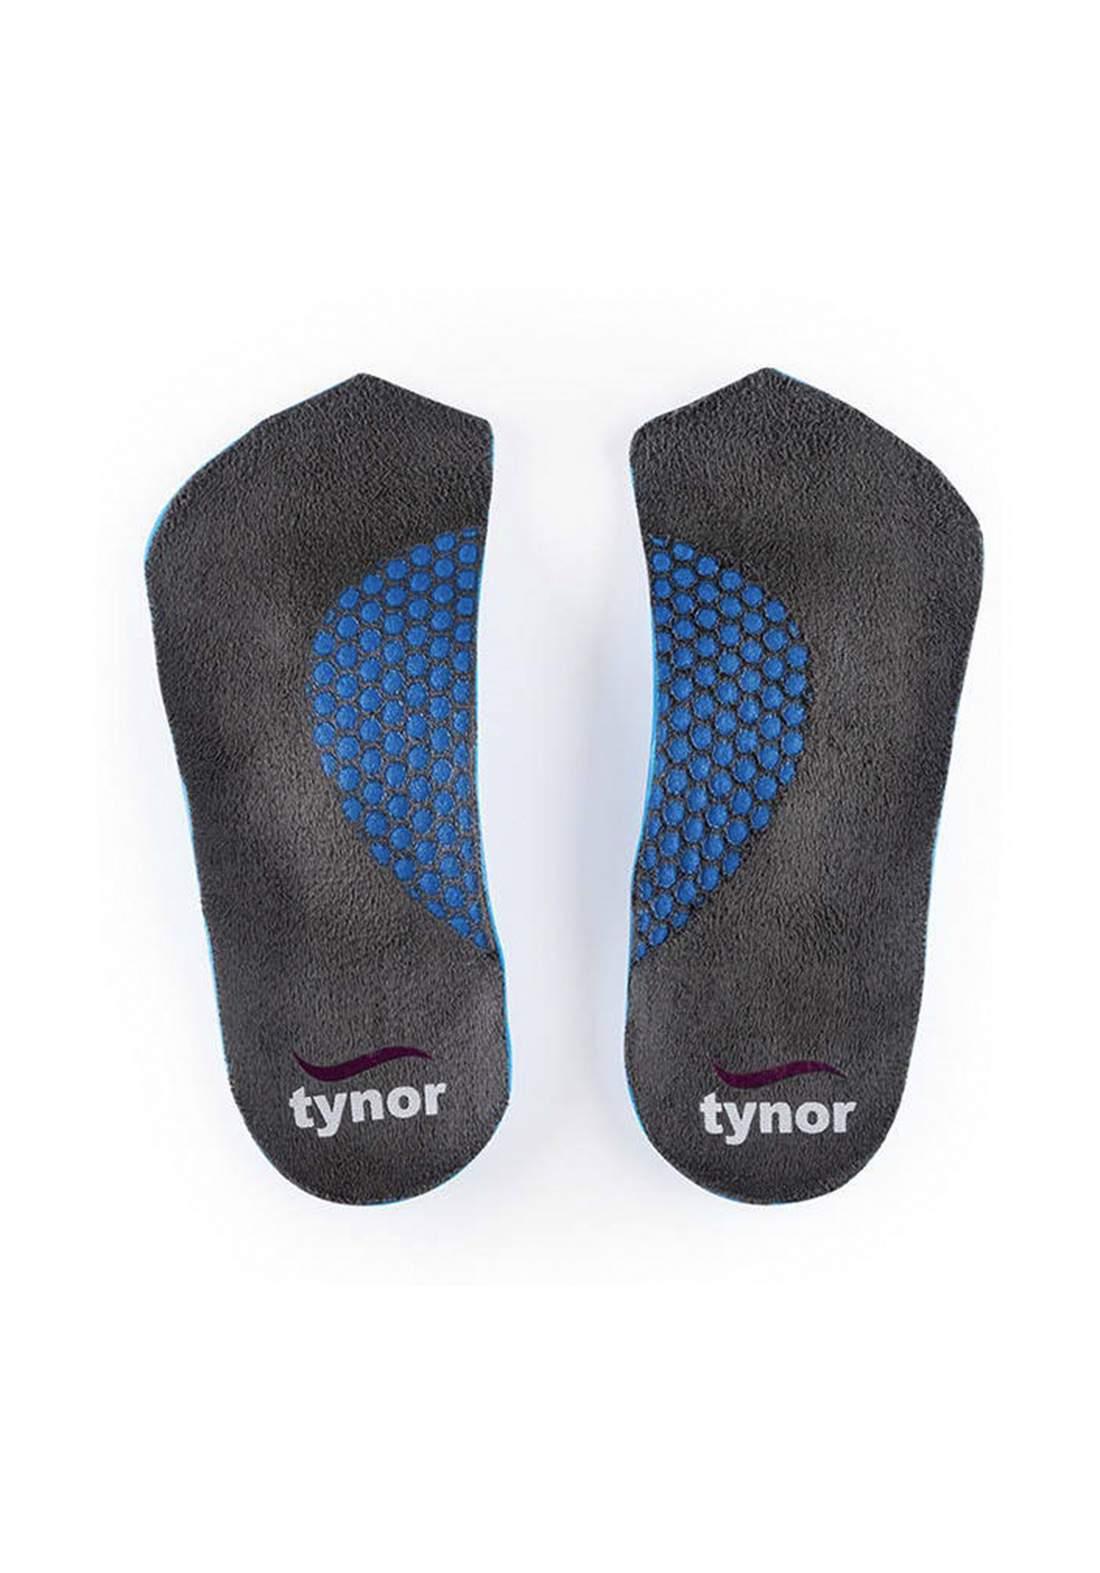 Tynor K-10 Medial Arch Orthosis Pair Adult جوارب للقدم